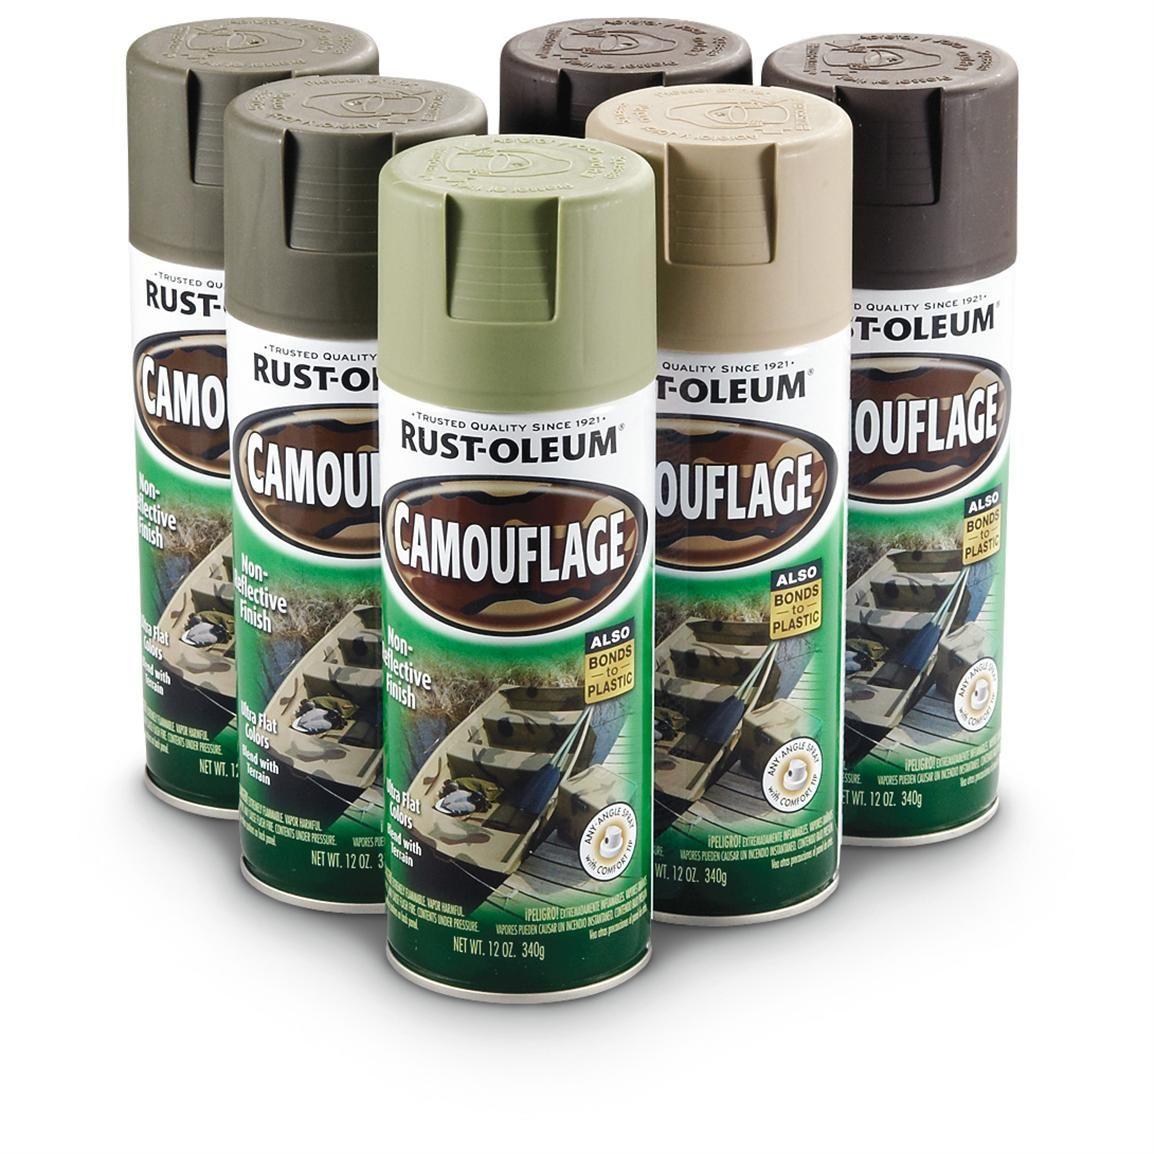 camouflage bedroom accessories   pc rustoleum camo paint ...